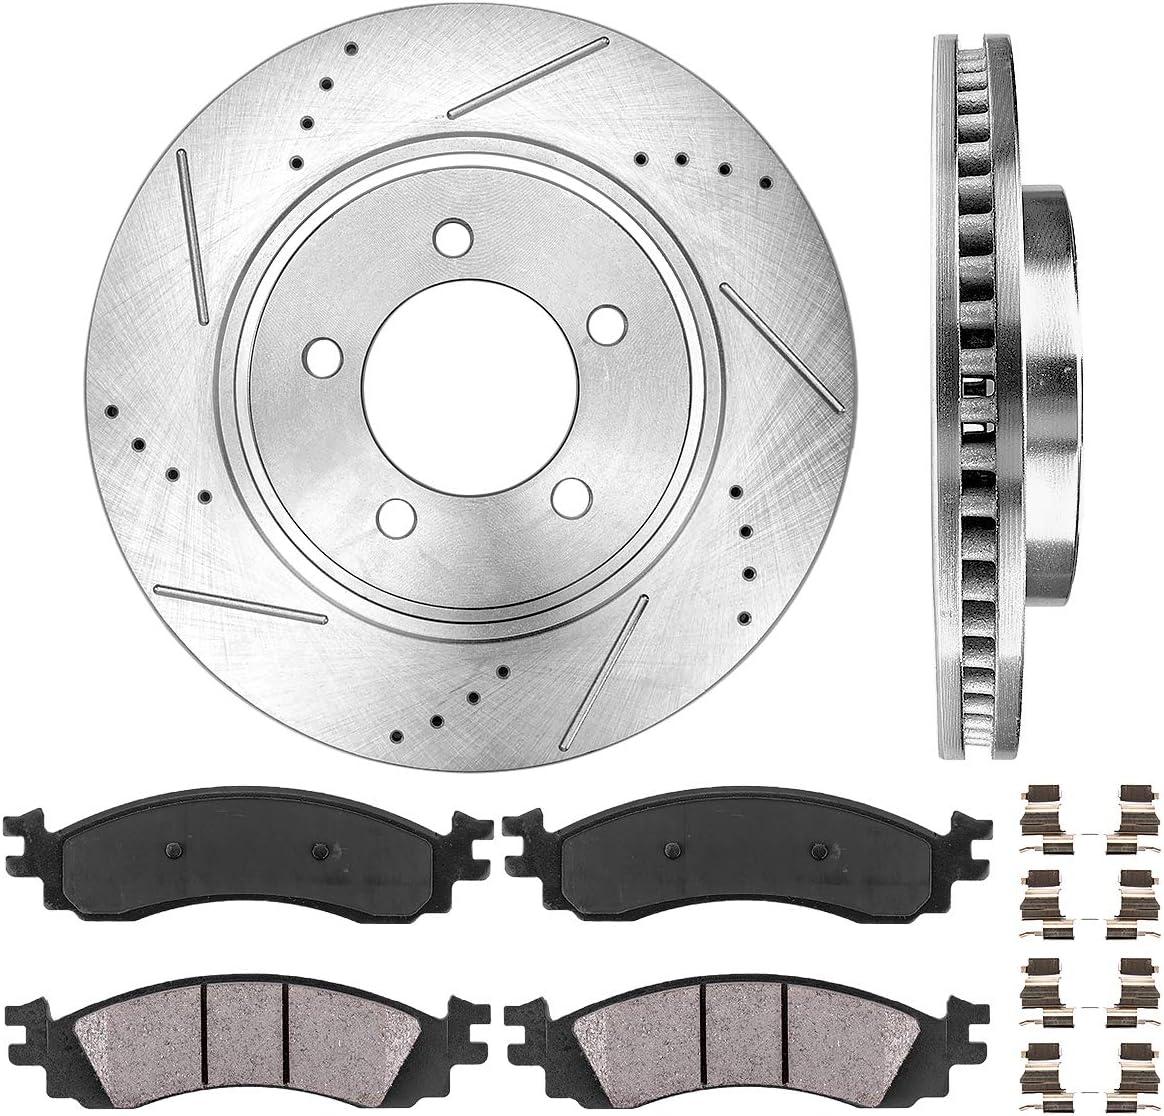 Callahan CDS02934 FRONT 305mm D S 高品質 5 Rotors Lug + Ceramic Bra 2 バースデー 記念日 ギフト 贈物 お勧め 通販